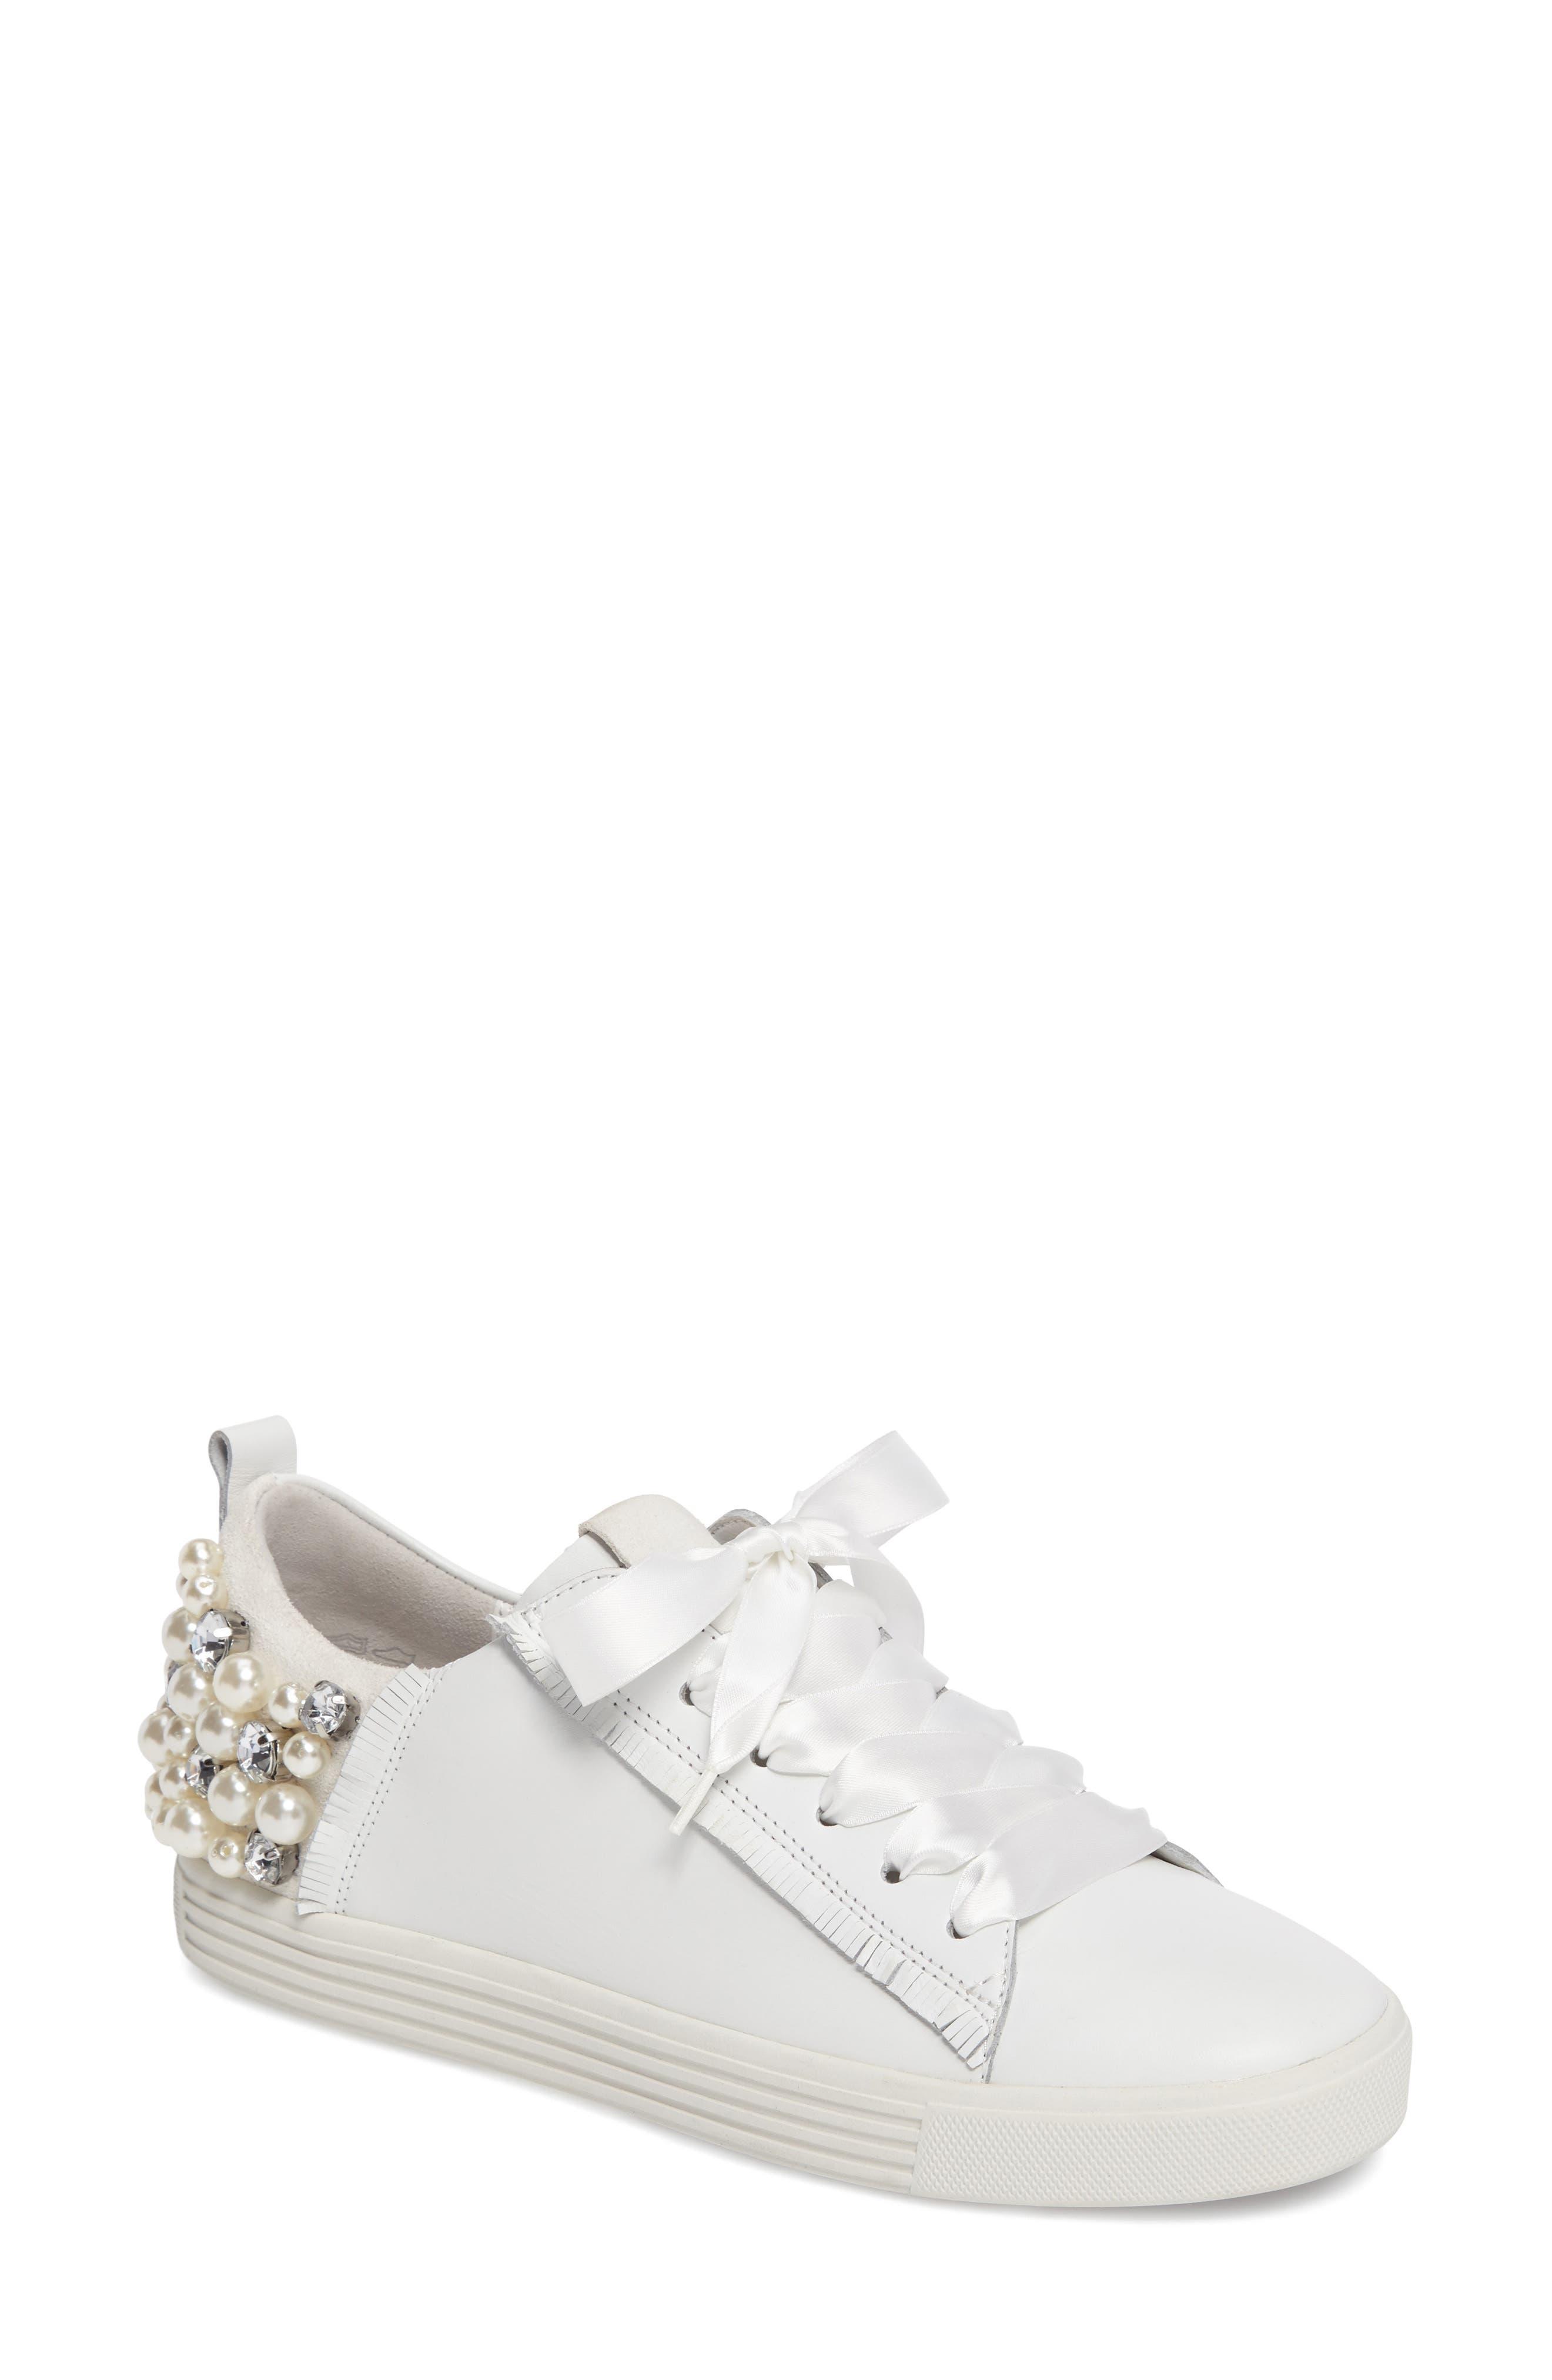 Alternate Image 1 Selected - Kennel & Schmenger Town Flower Sneaker (Women)